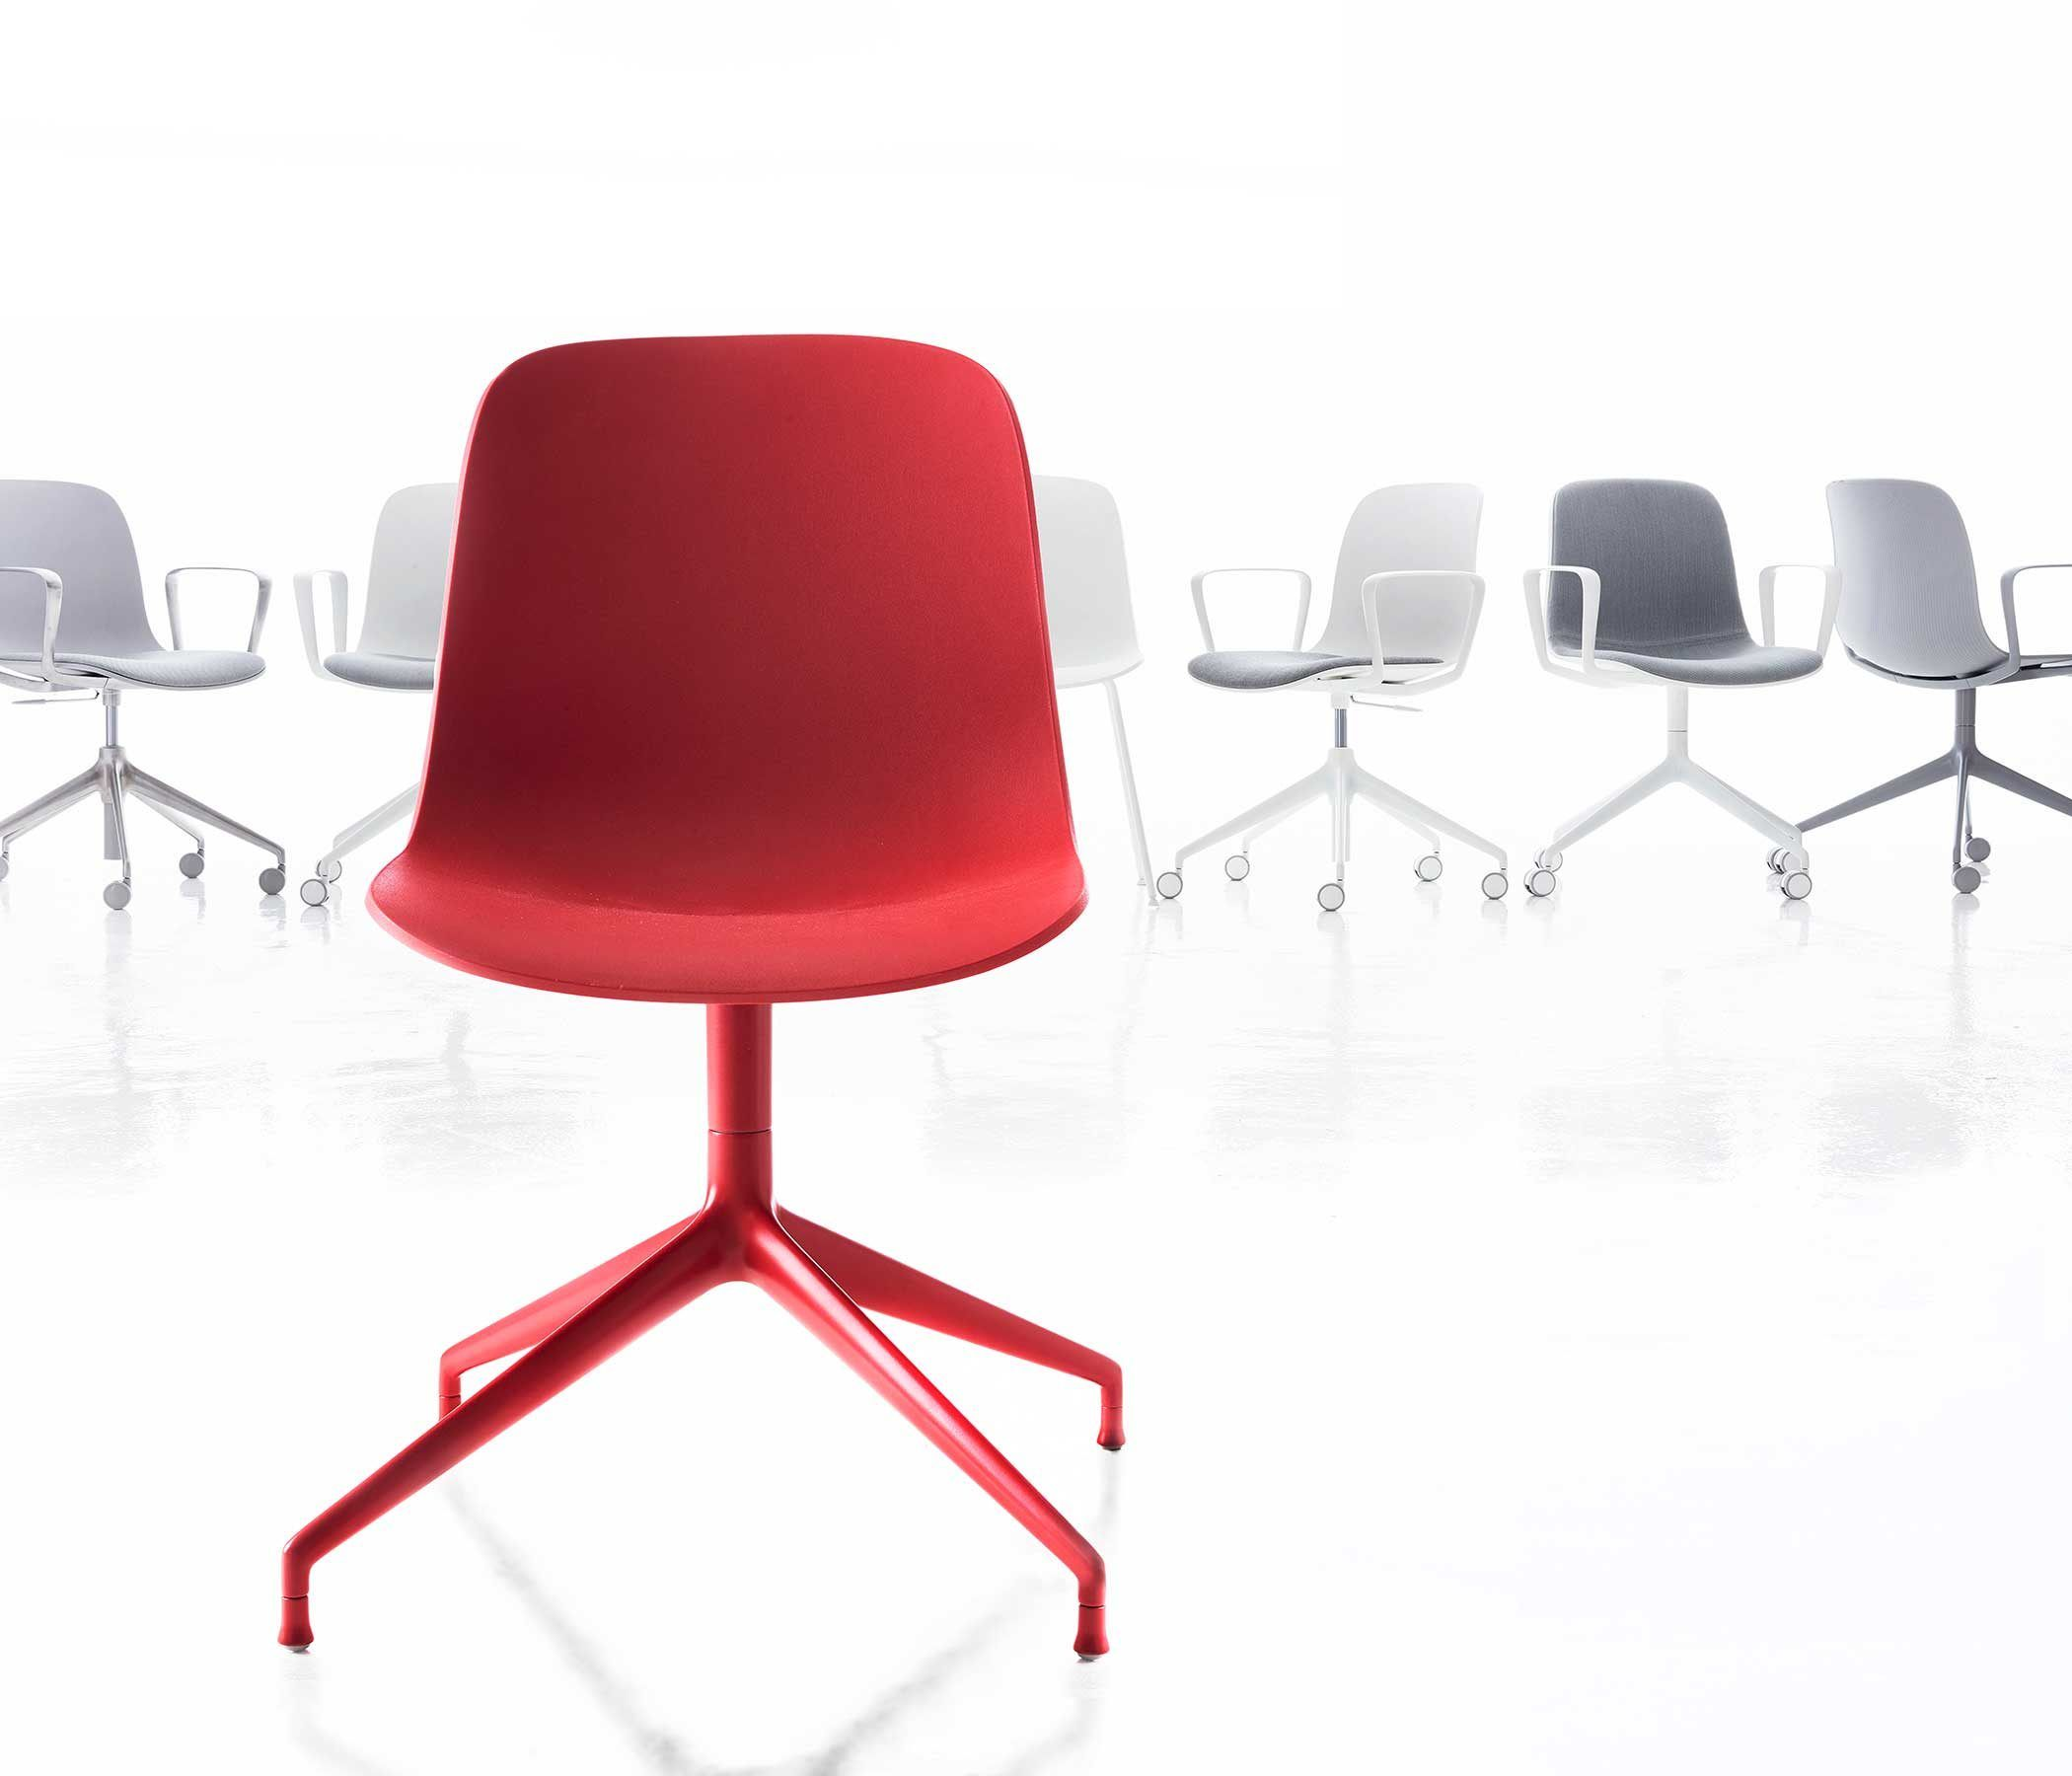 Verve X2f Products X2f Stylex Ergonomic Seating Chair